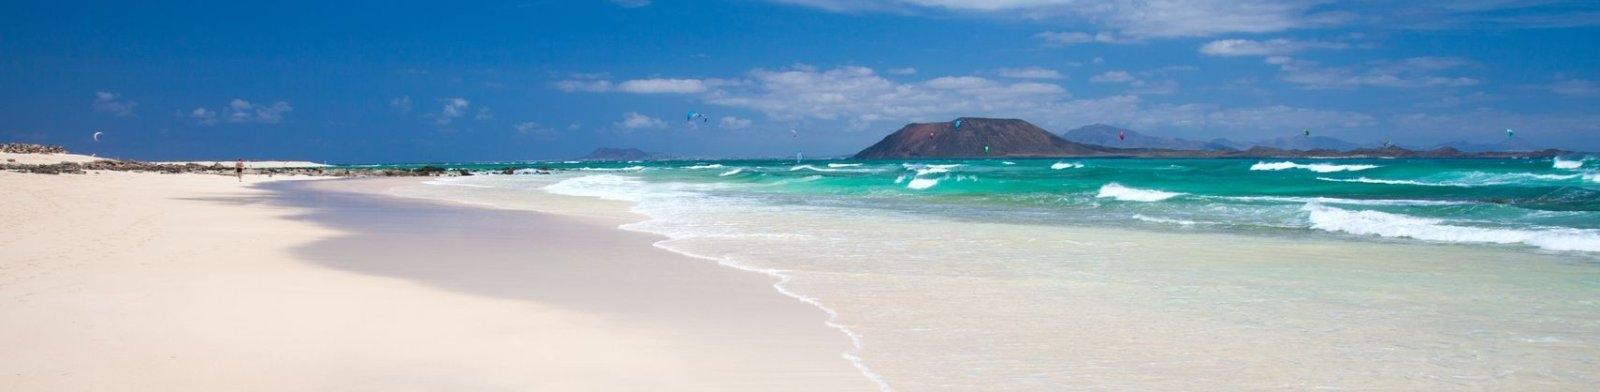 Beach Holidays, Corralejo beach